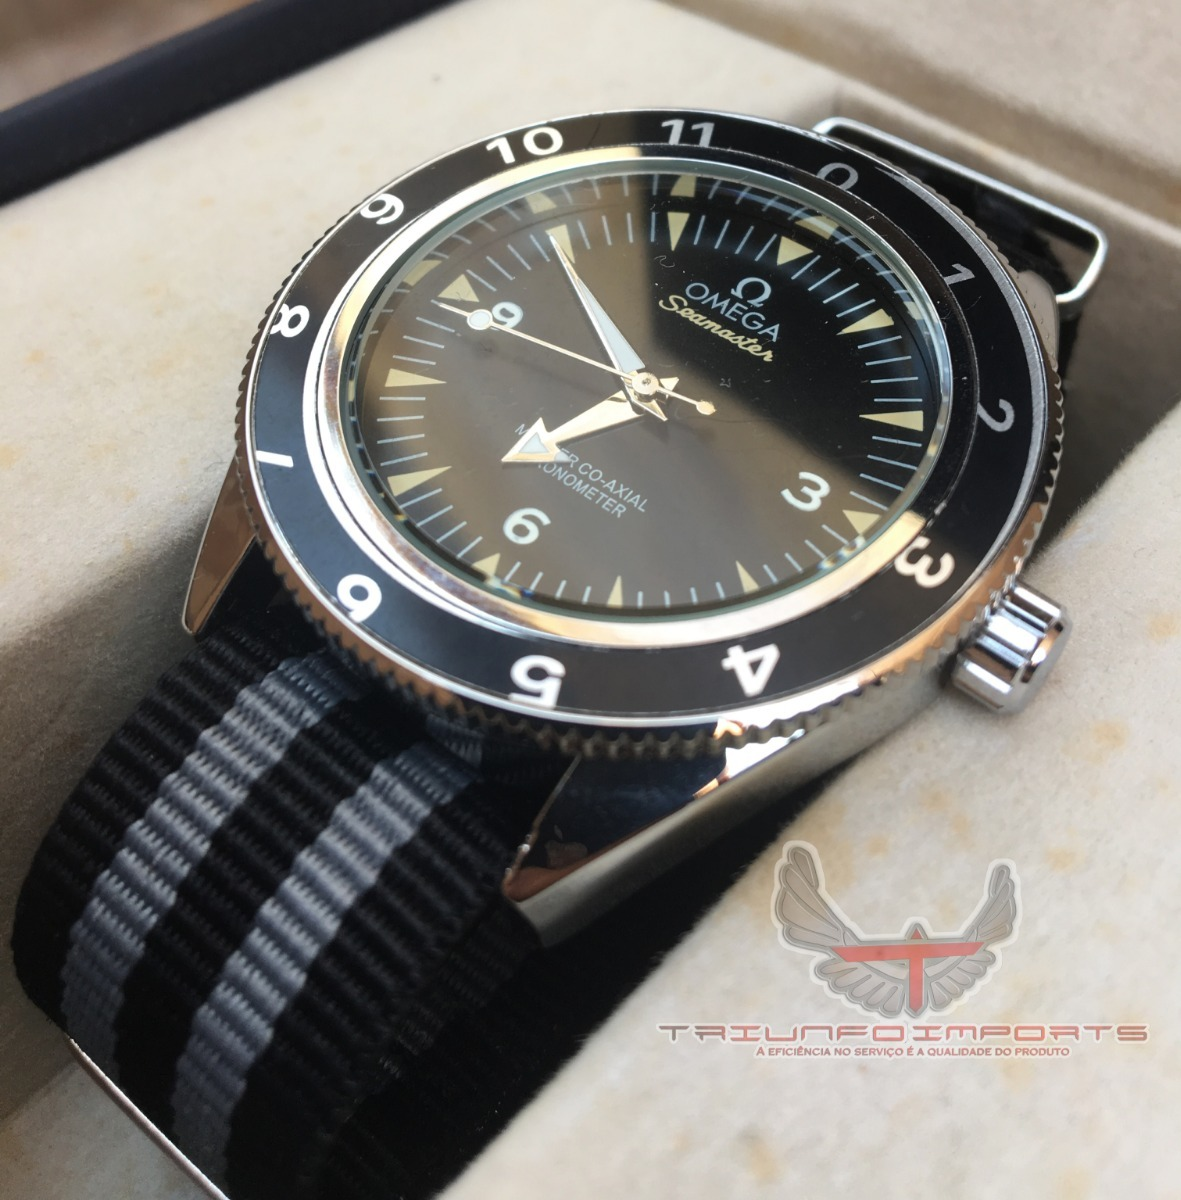 068ea19145e relógio omega seamaster 007 spectre. Carregando zoom.